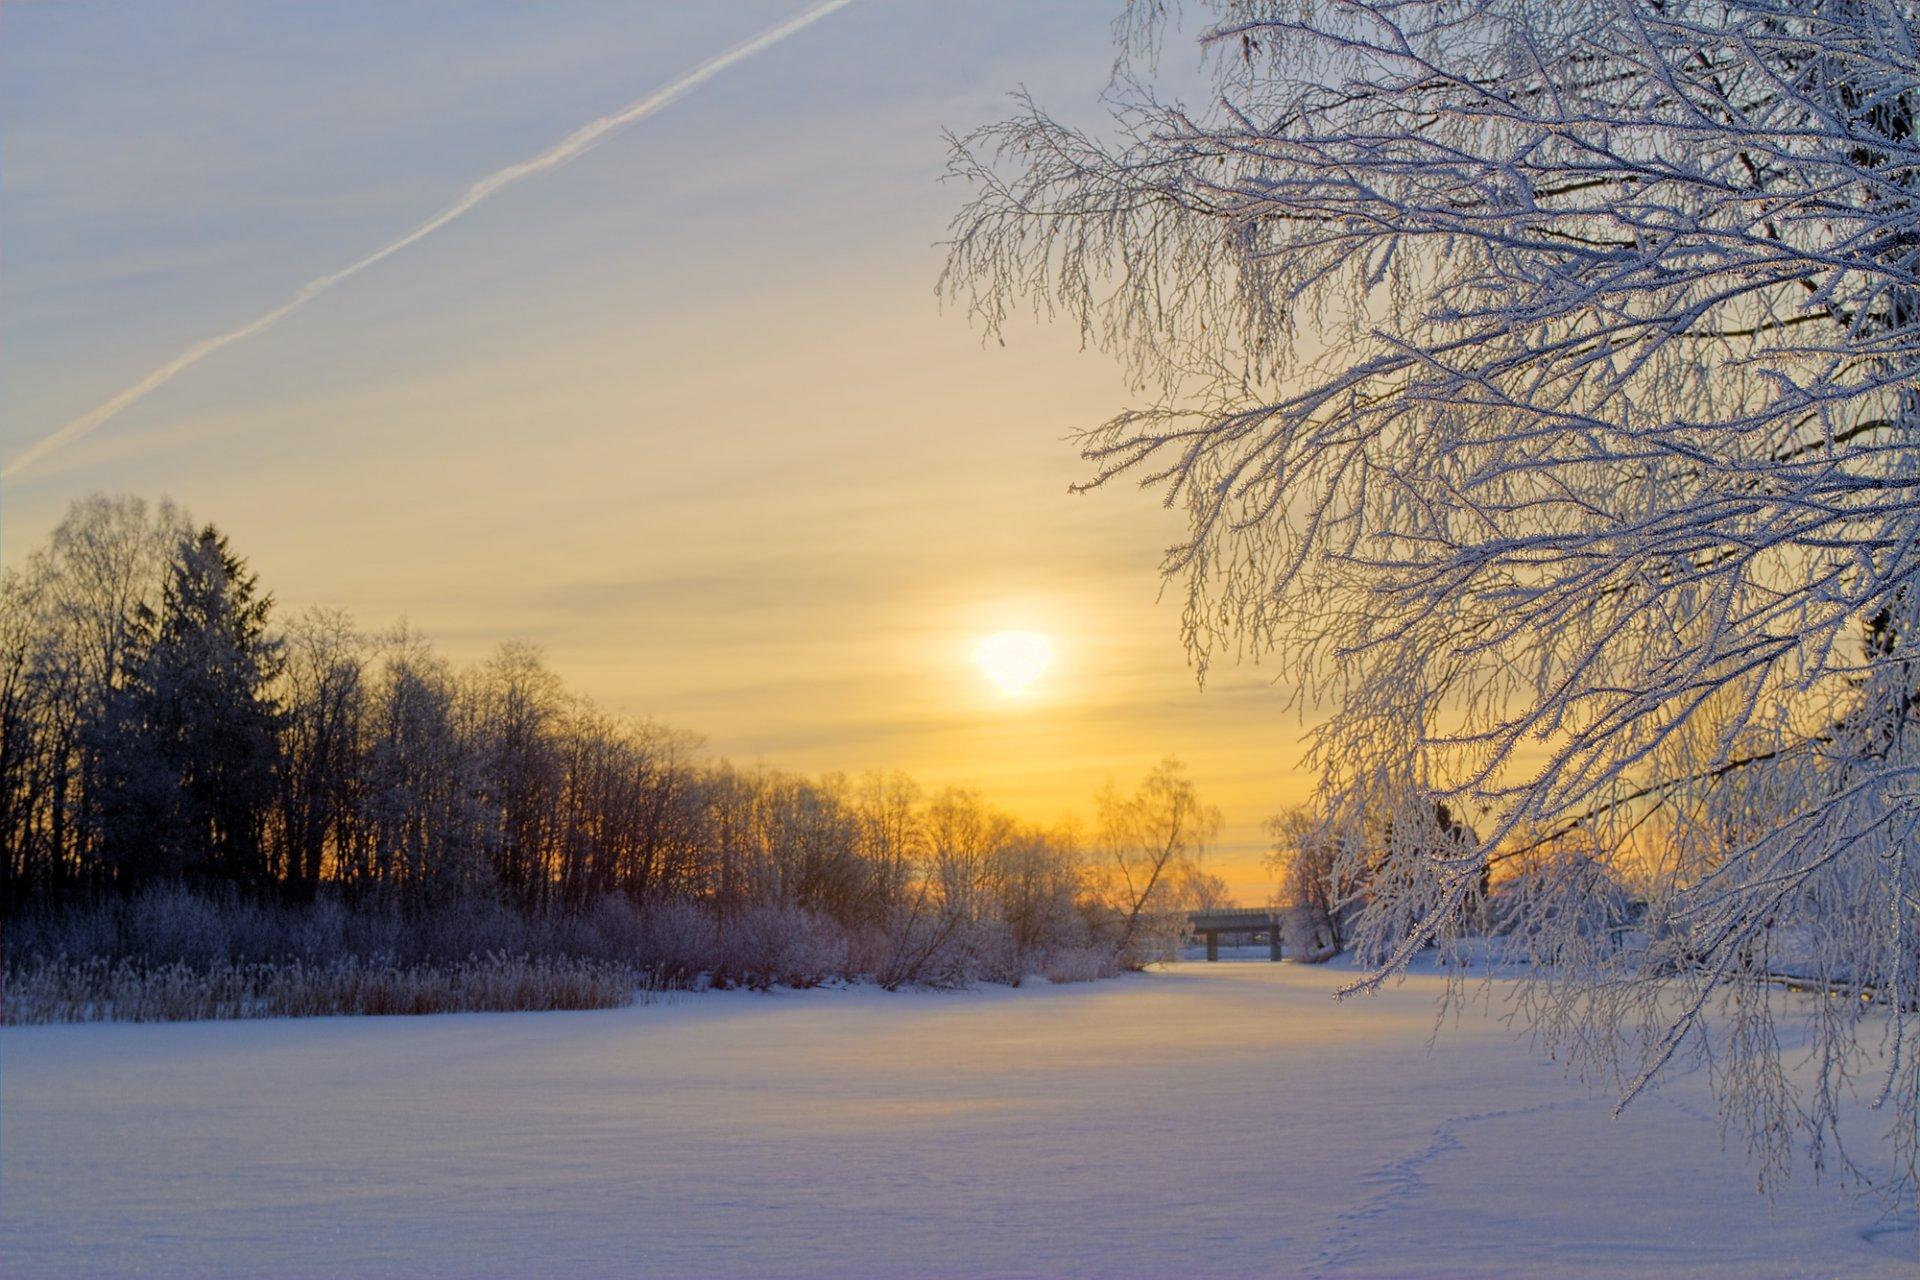 утро солнце снег картинки вас нет нужного